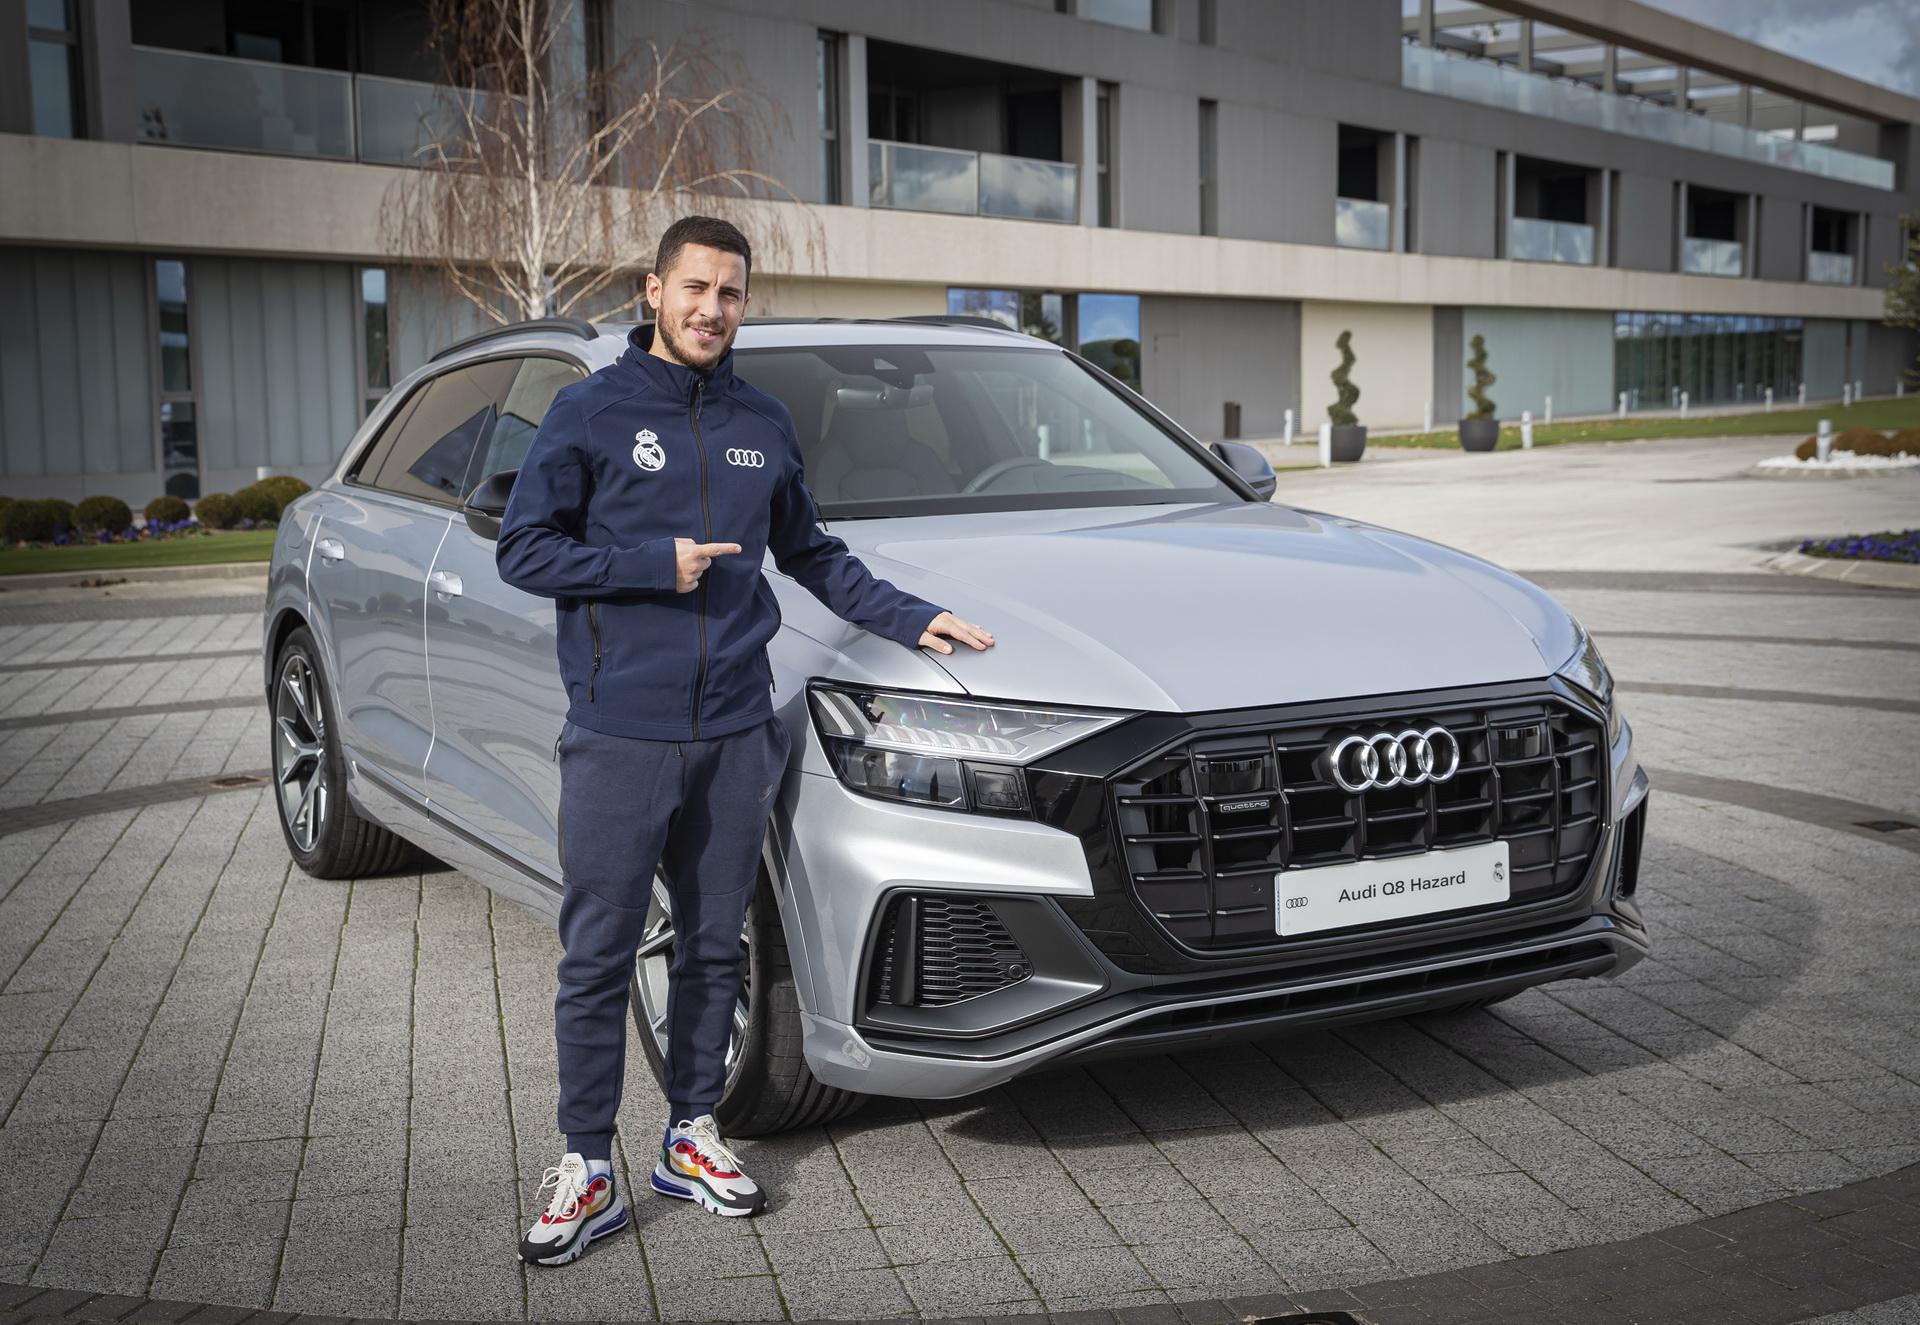 Real_Madrid_Players_Audi_0014